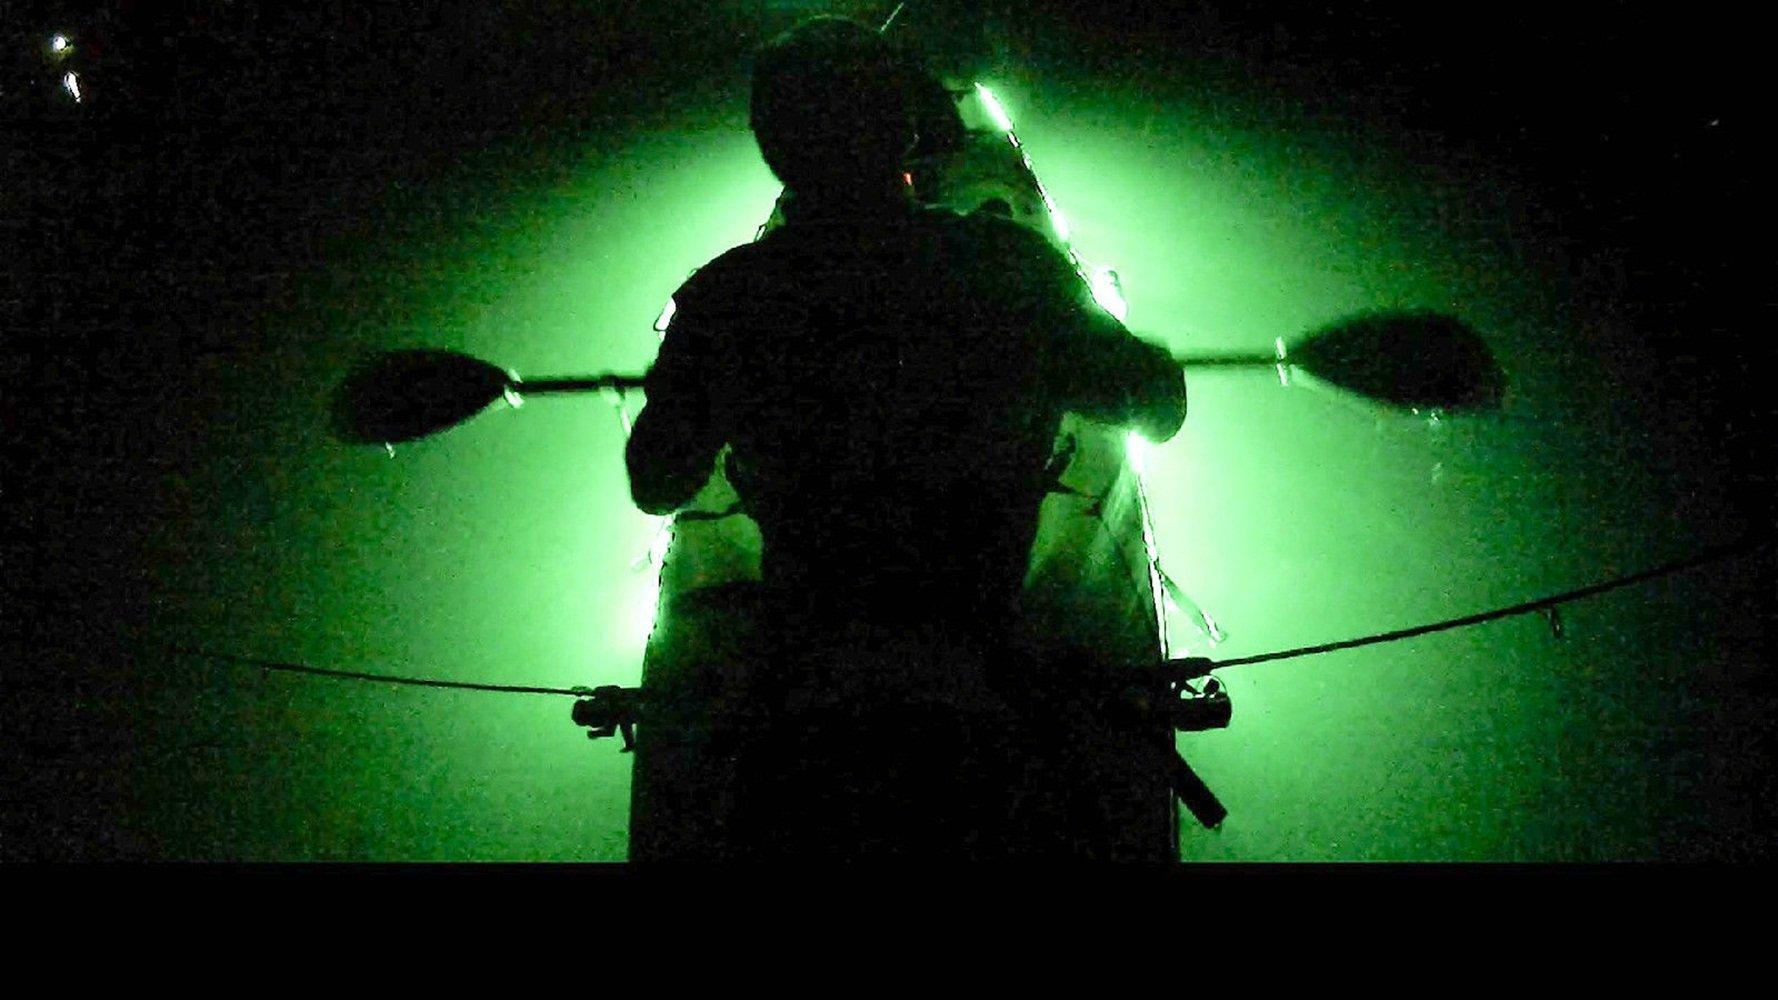 Kayak Led Lighting Add On Power Savor L.E.D. Green Fishing Lights Kayak Canoe Kit Attract Fish